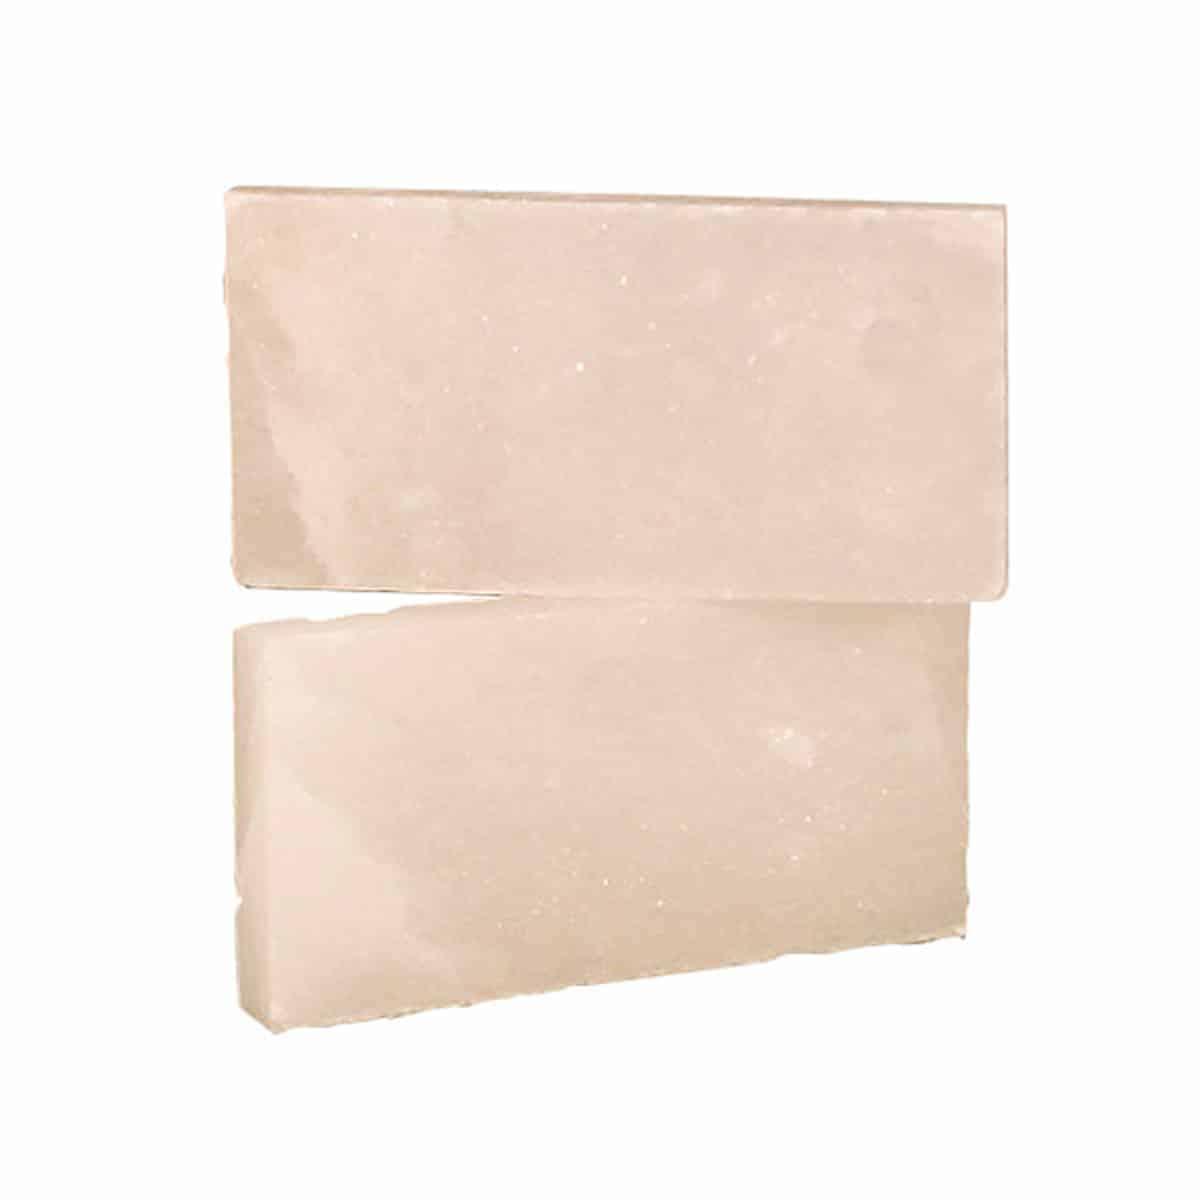 "4"" x 8"" x 1"" White Himalayan Salt Bricks"